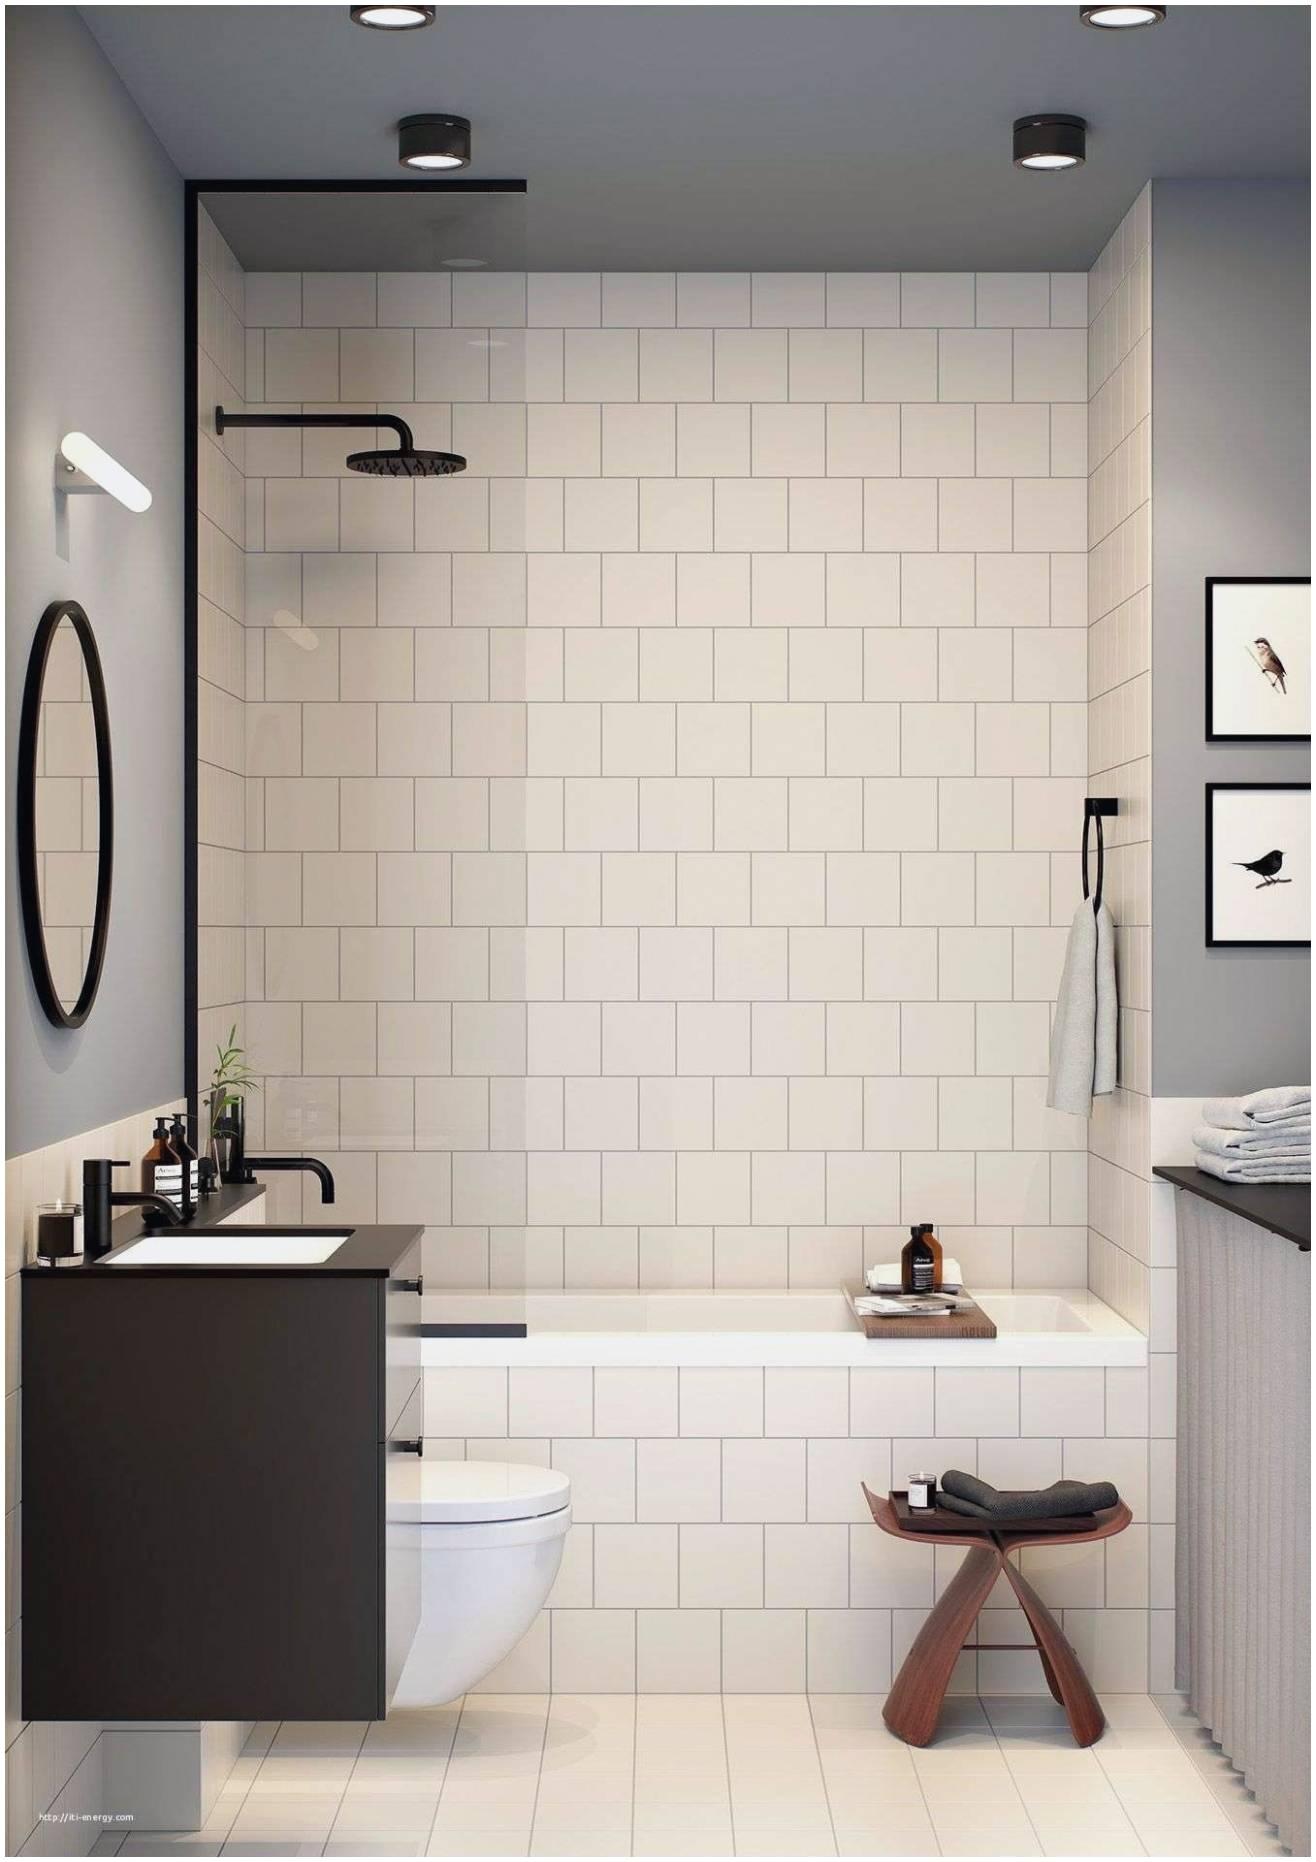 New Home Bathroom Designs Best Tiny House Bathroom Design Jackolanternliquors for New Home Bathroom